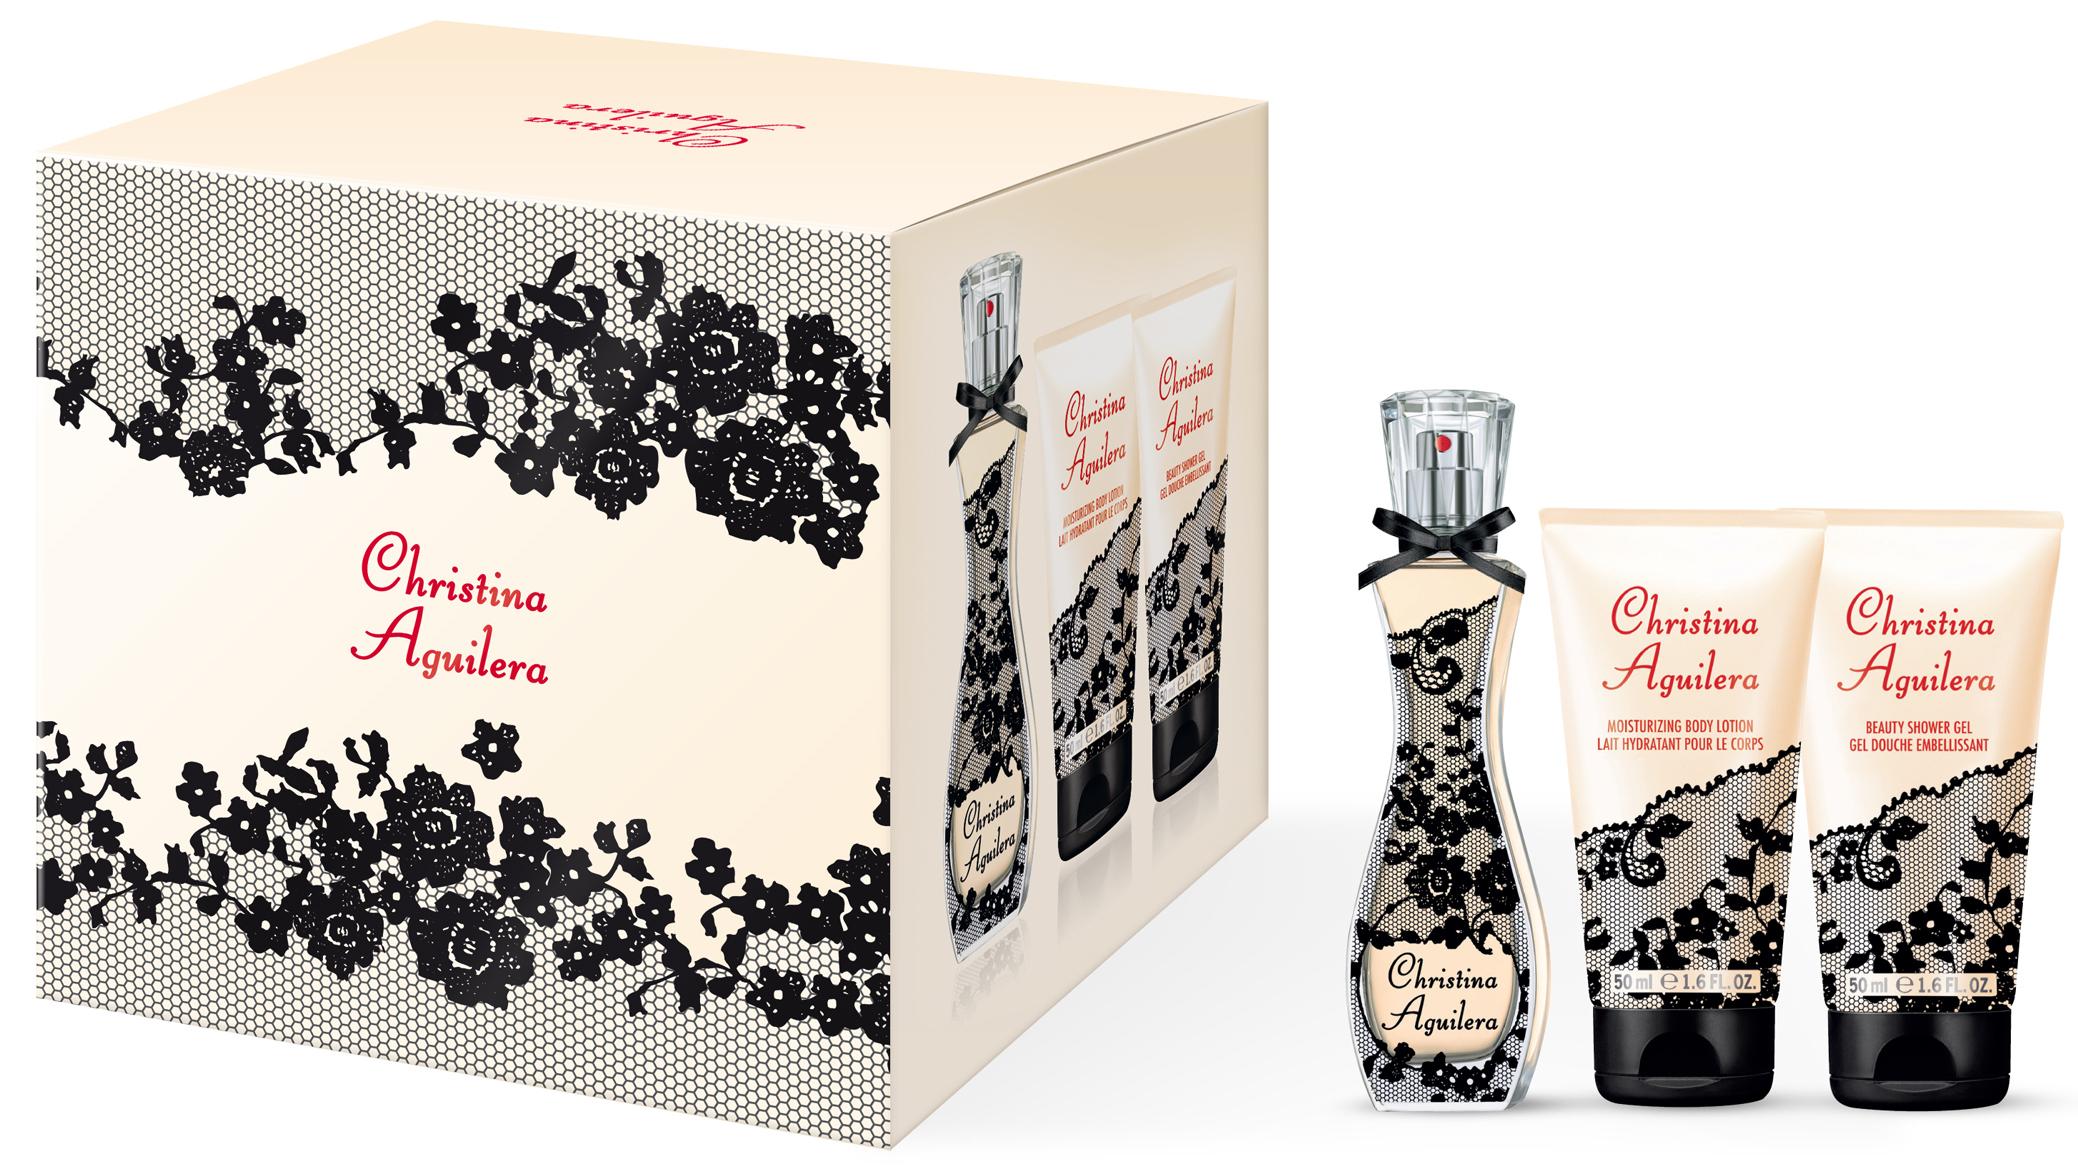 Christina Aguilera Signature parfémovaná voda 30 ml + sprchový gel 50 ml + tělové mléko 50 ml, dárková sada